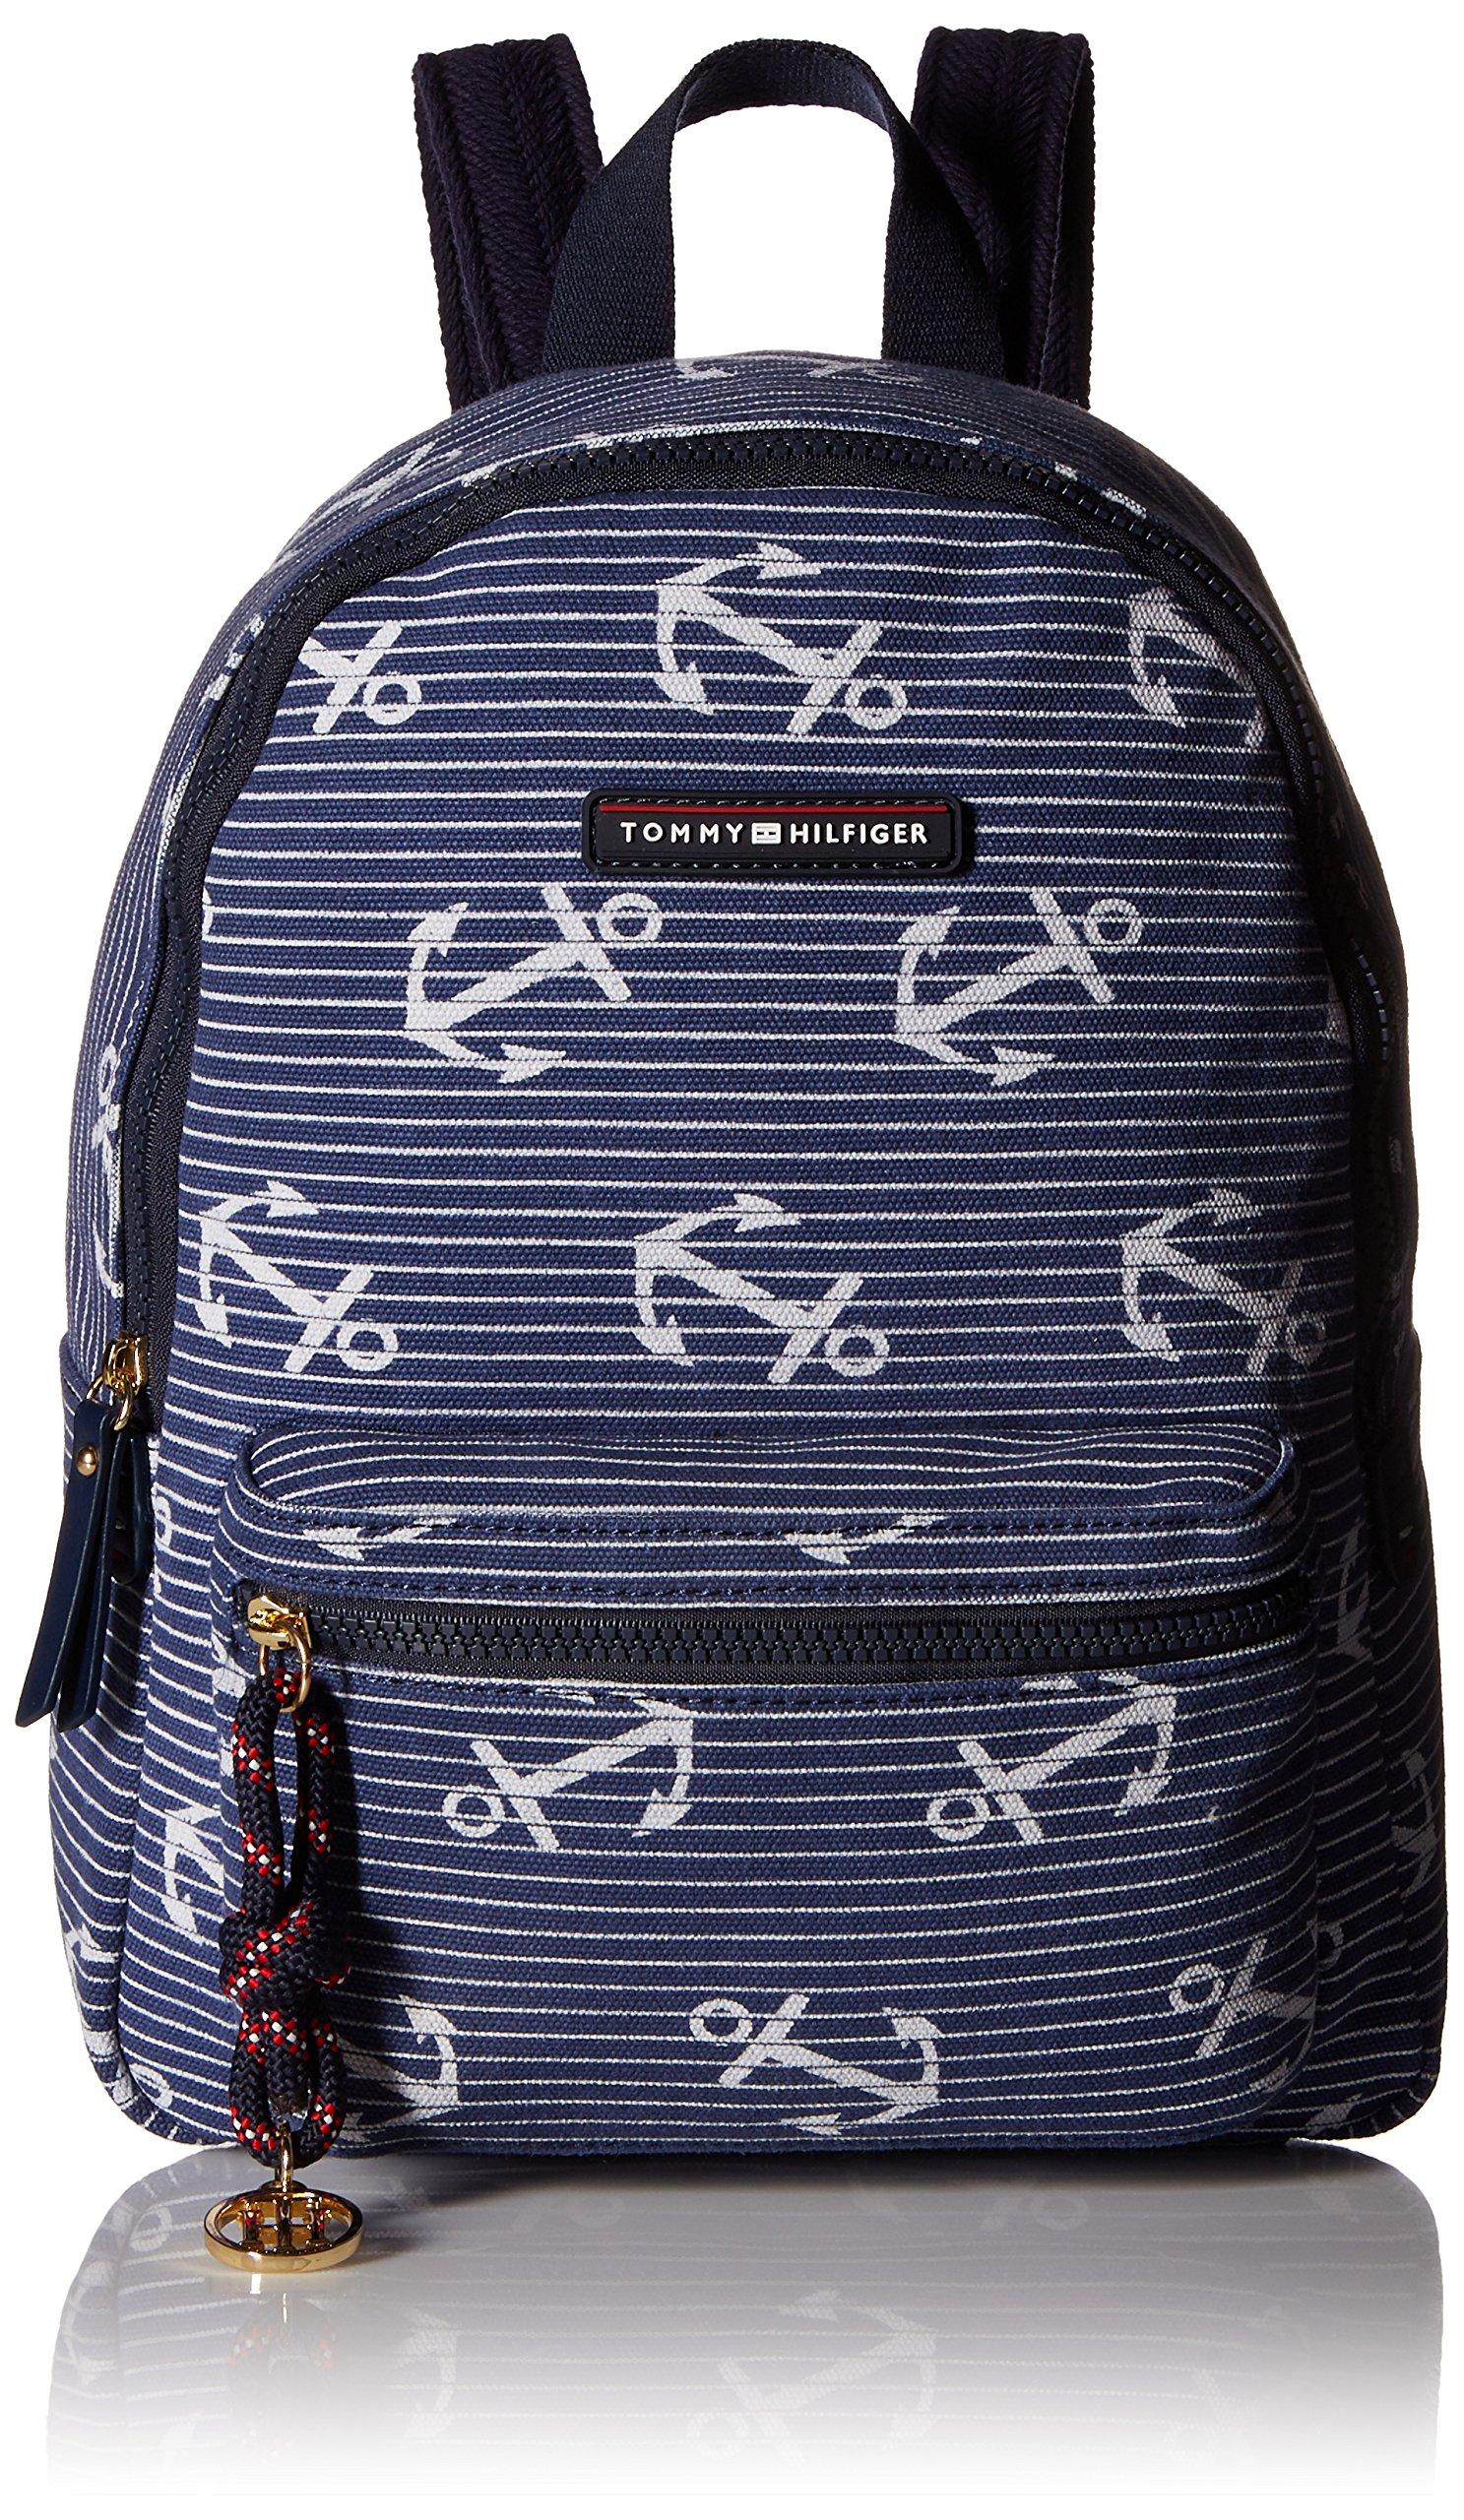 Tommy Hilfiger Backpack Dariana, Navy/White